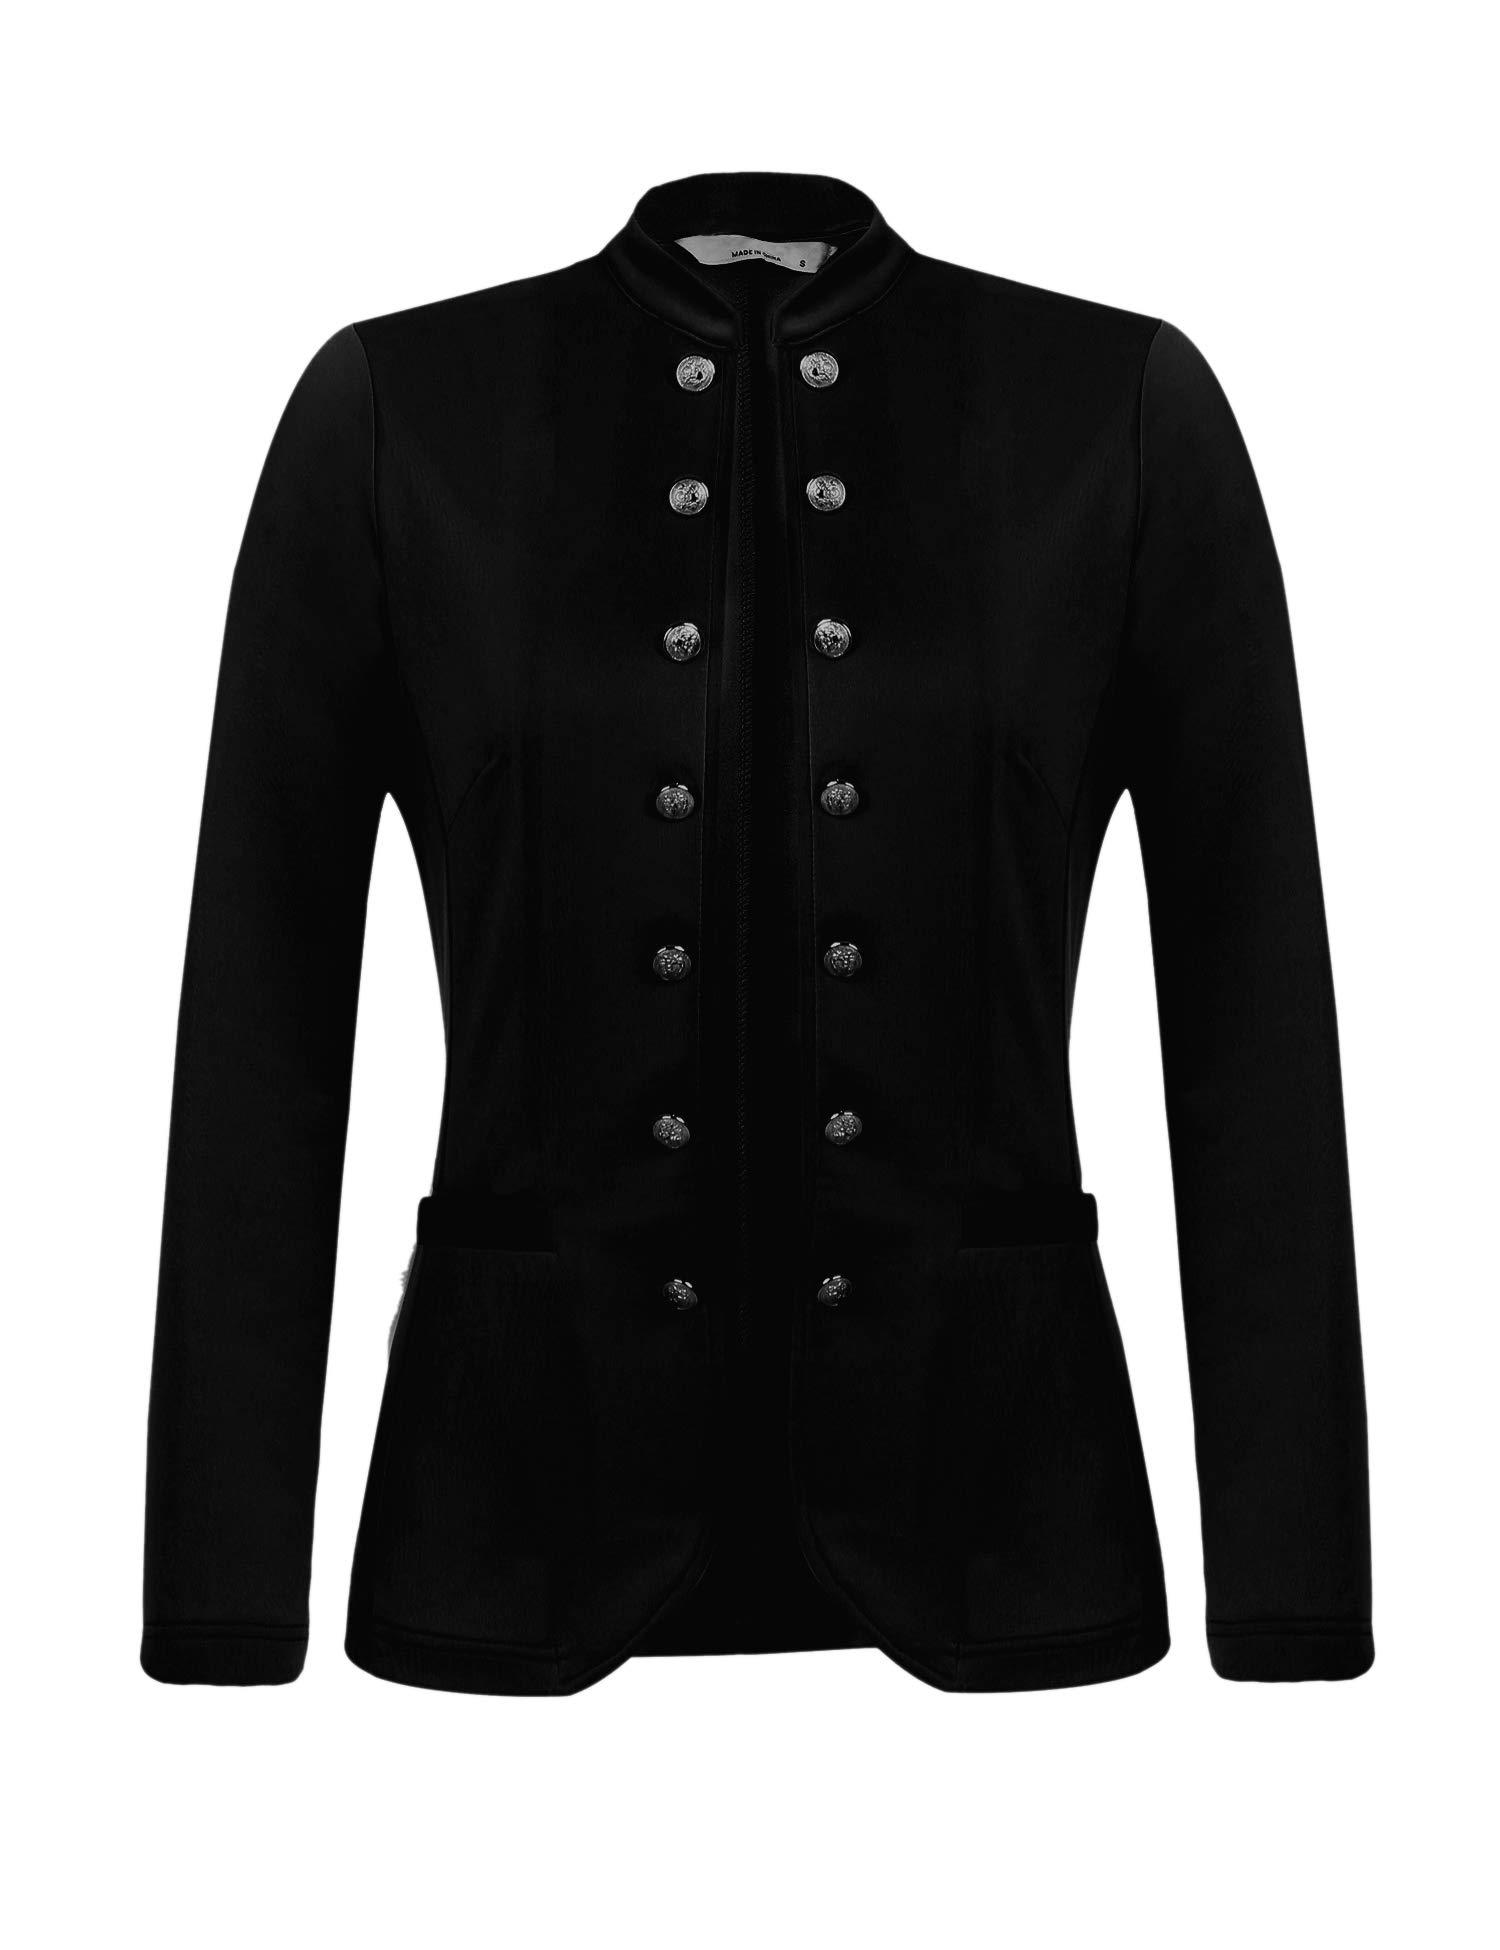 Beyove Women Casual Work Office Open Front Button Stand-up Collar Cardigan Blazer Jacket